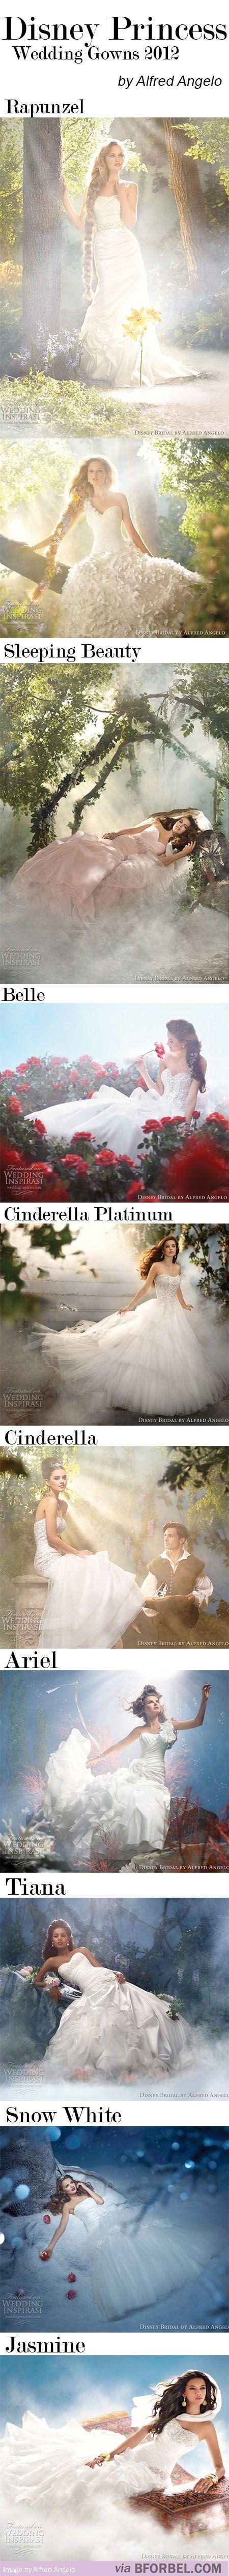 Disney Princess Wedding Gowns 2012.